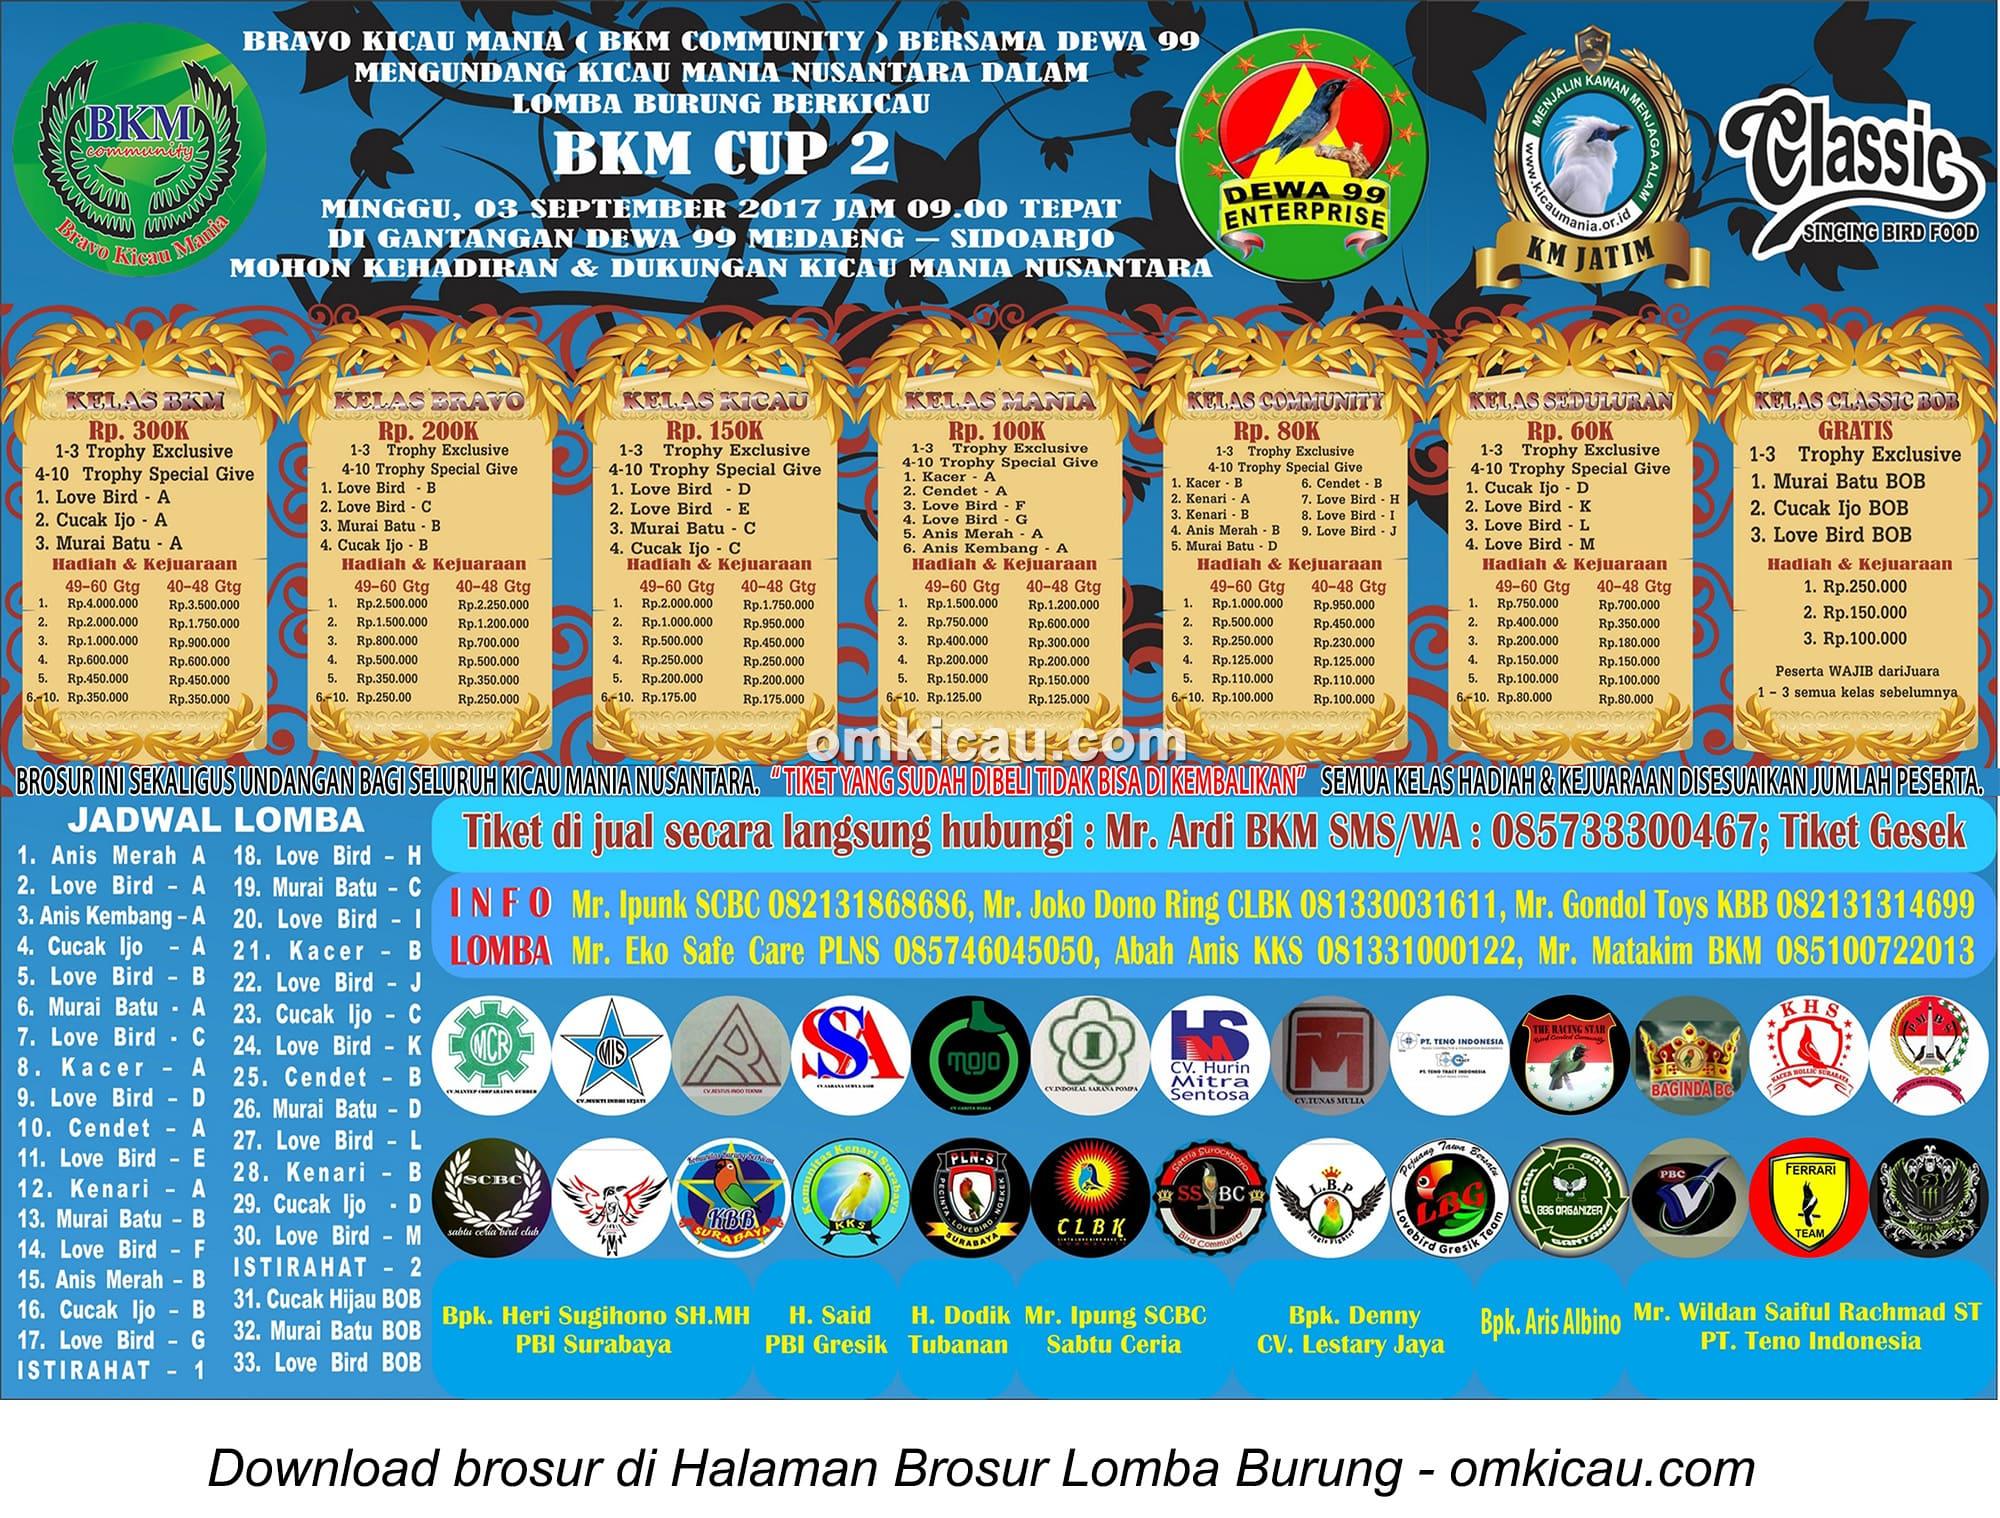 bkm cup 2